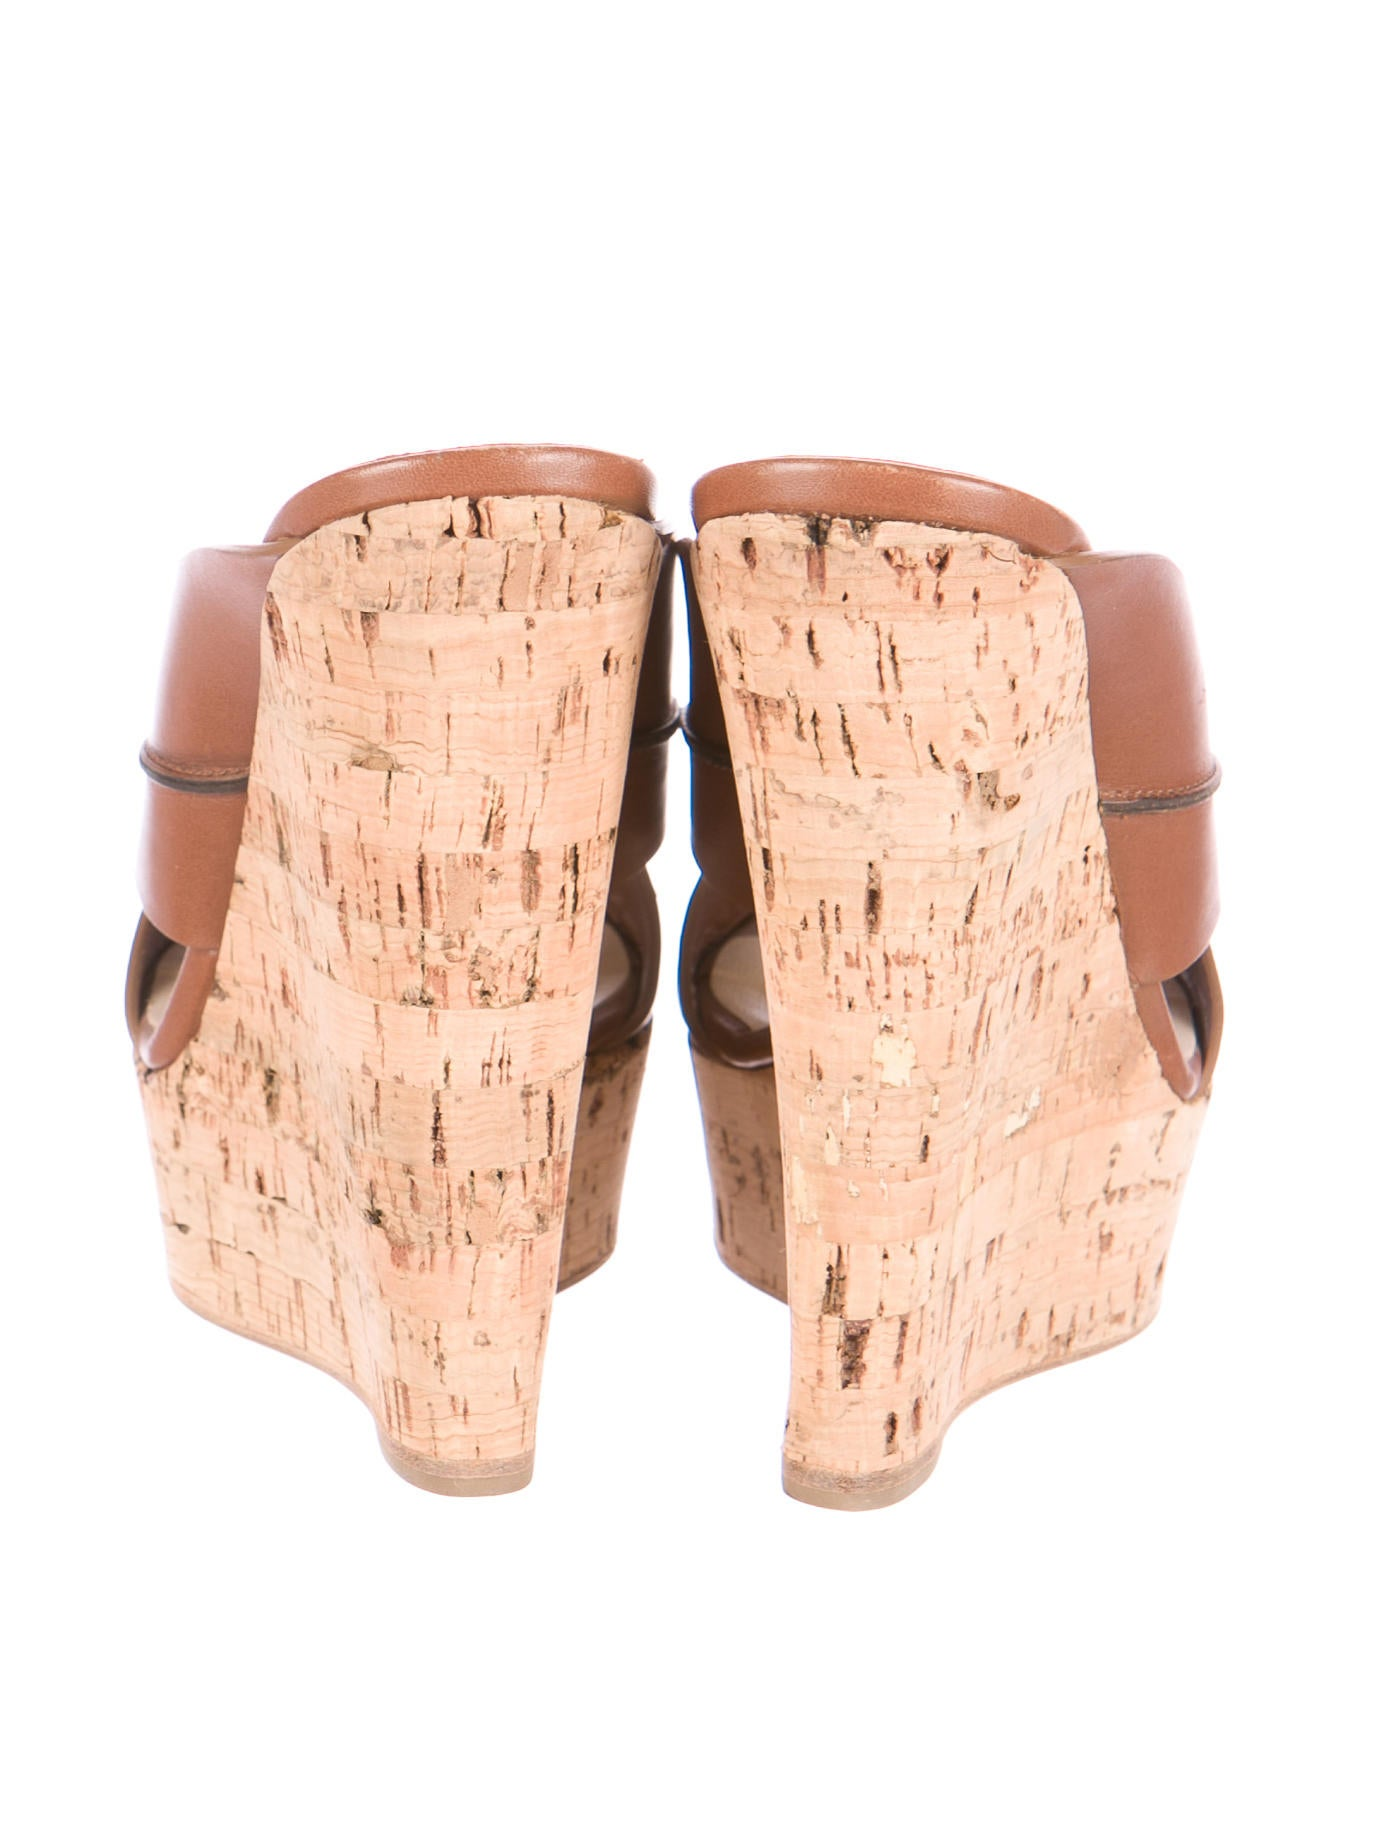 Christian Louboutin Slide Platform Wedges - Shoes - CHT44419 | The ...